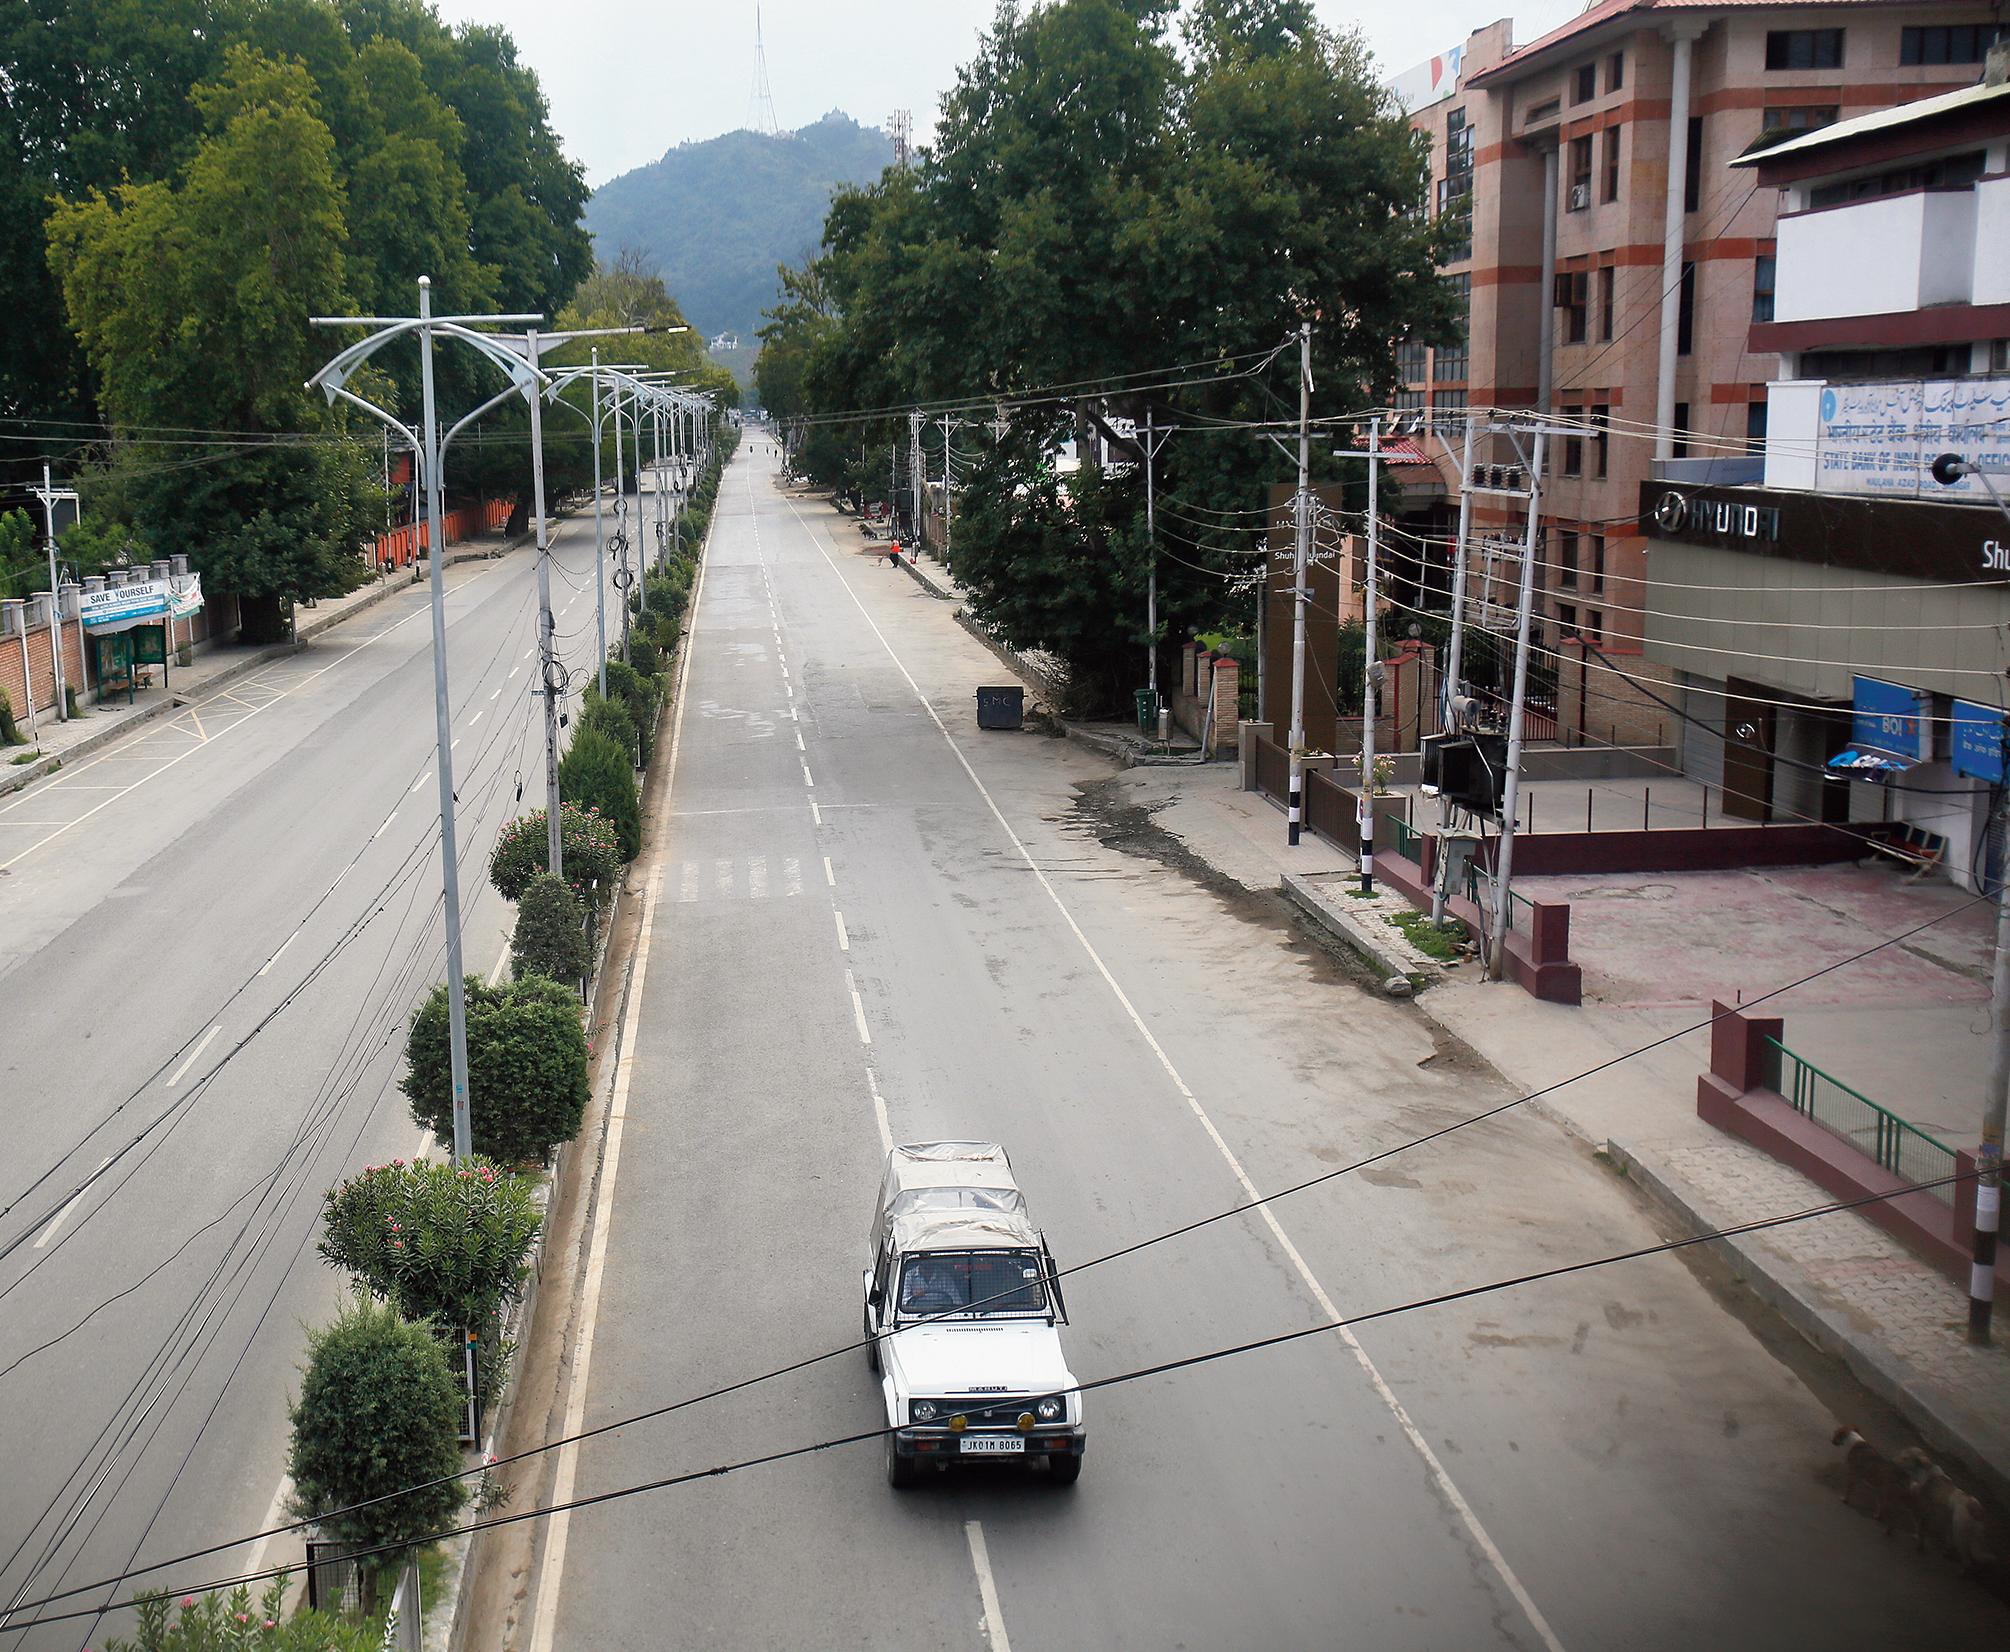 A street in Srinagar on Monday.